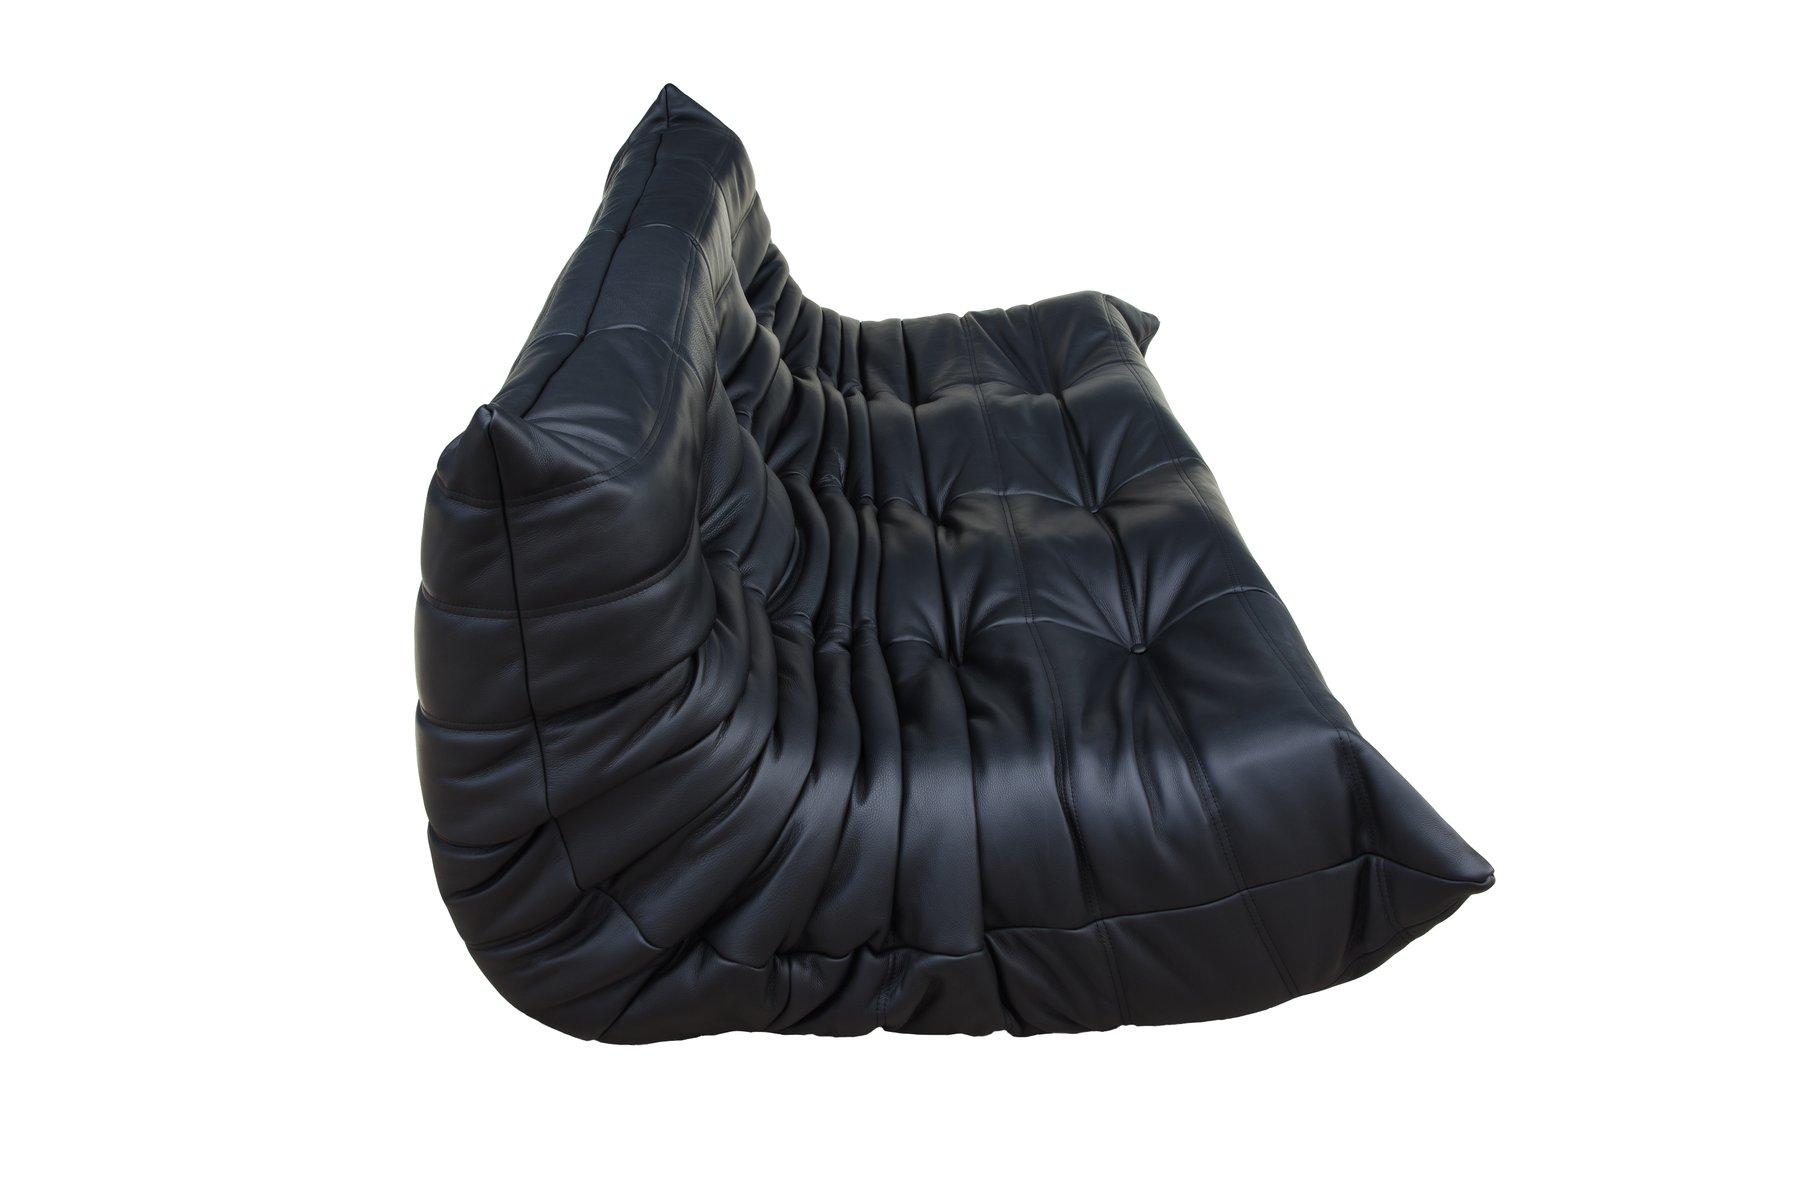 schwarzes 3 sitzer togo ledersofa von michel ducaroy f r. Black Bedroom Furniture Sets. Home Design Ideas